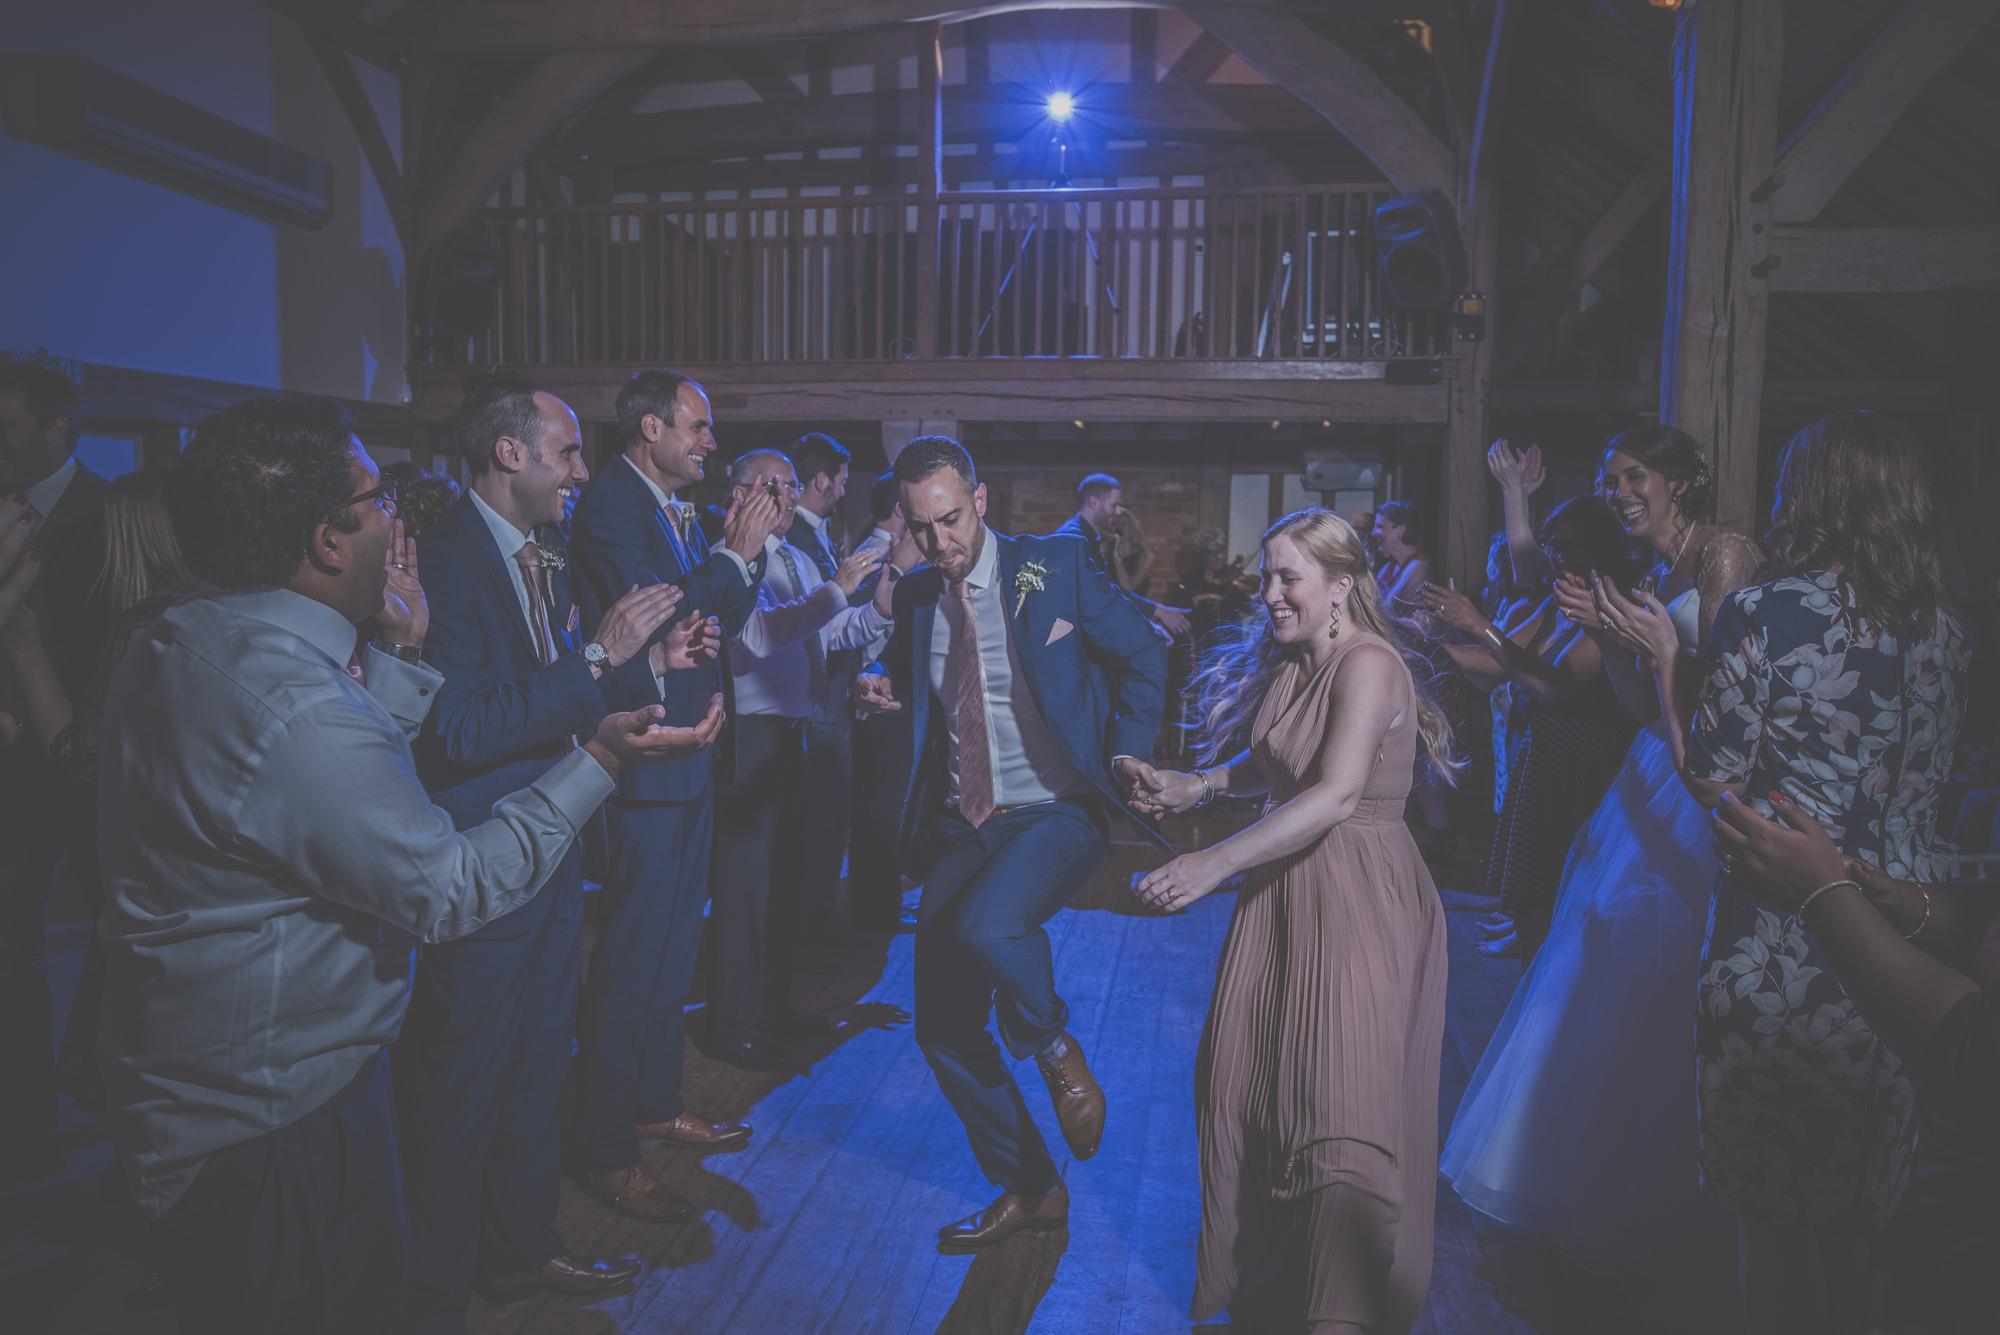 Charisse-and-James-wedding-in-Cain-Manor-Venue-Hampshire-Manu-Mendoza-Wedding-Photography-563.jpg